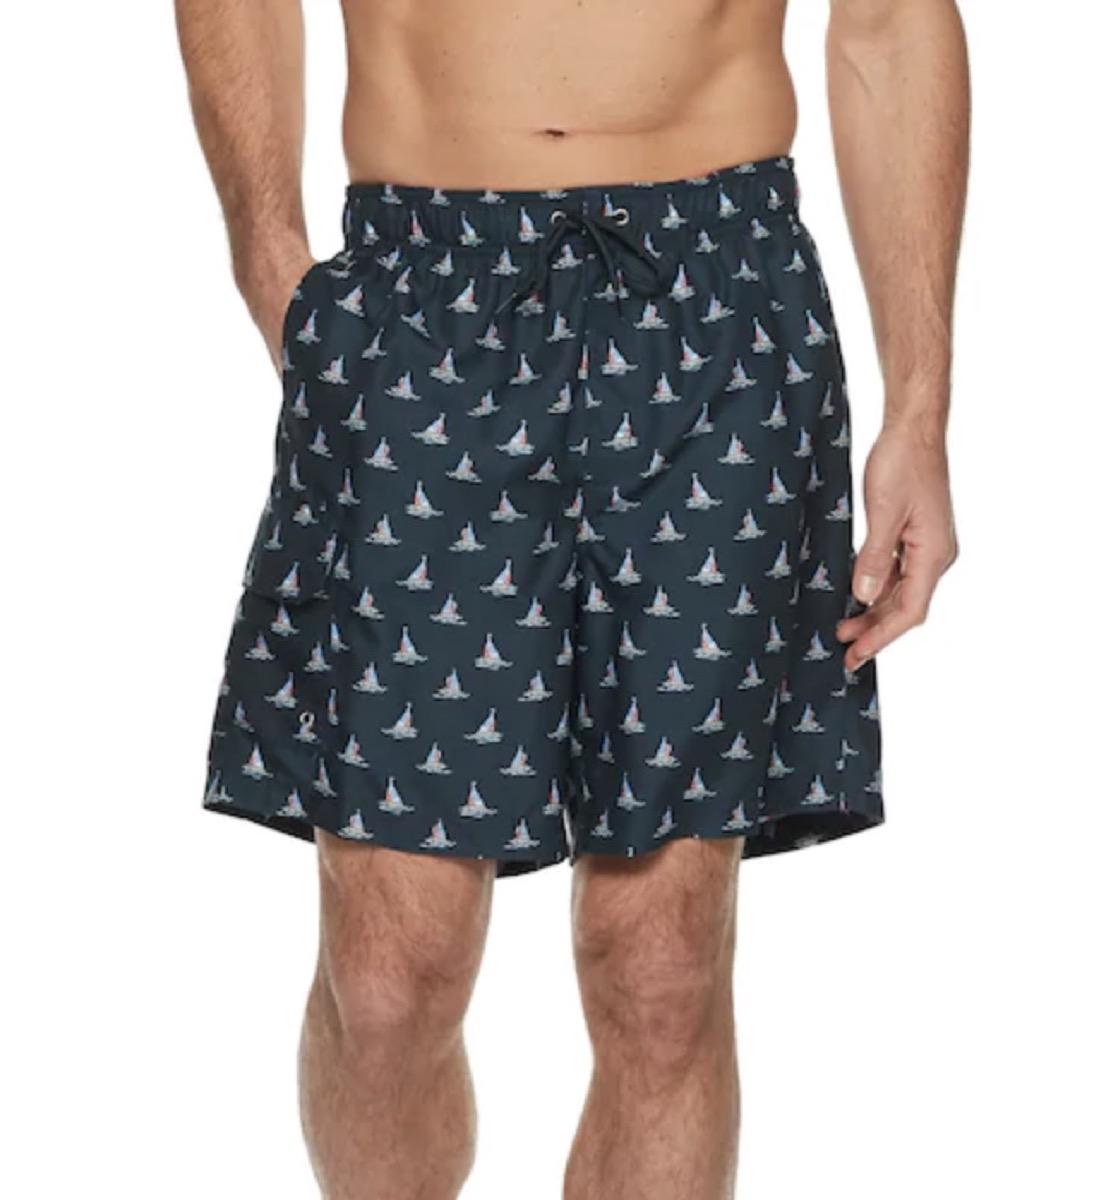 sailboat swim trunks, cheap swimsuits